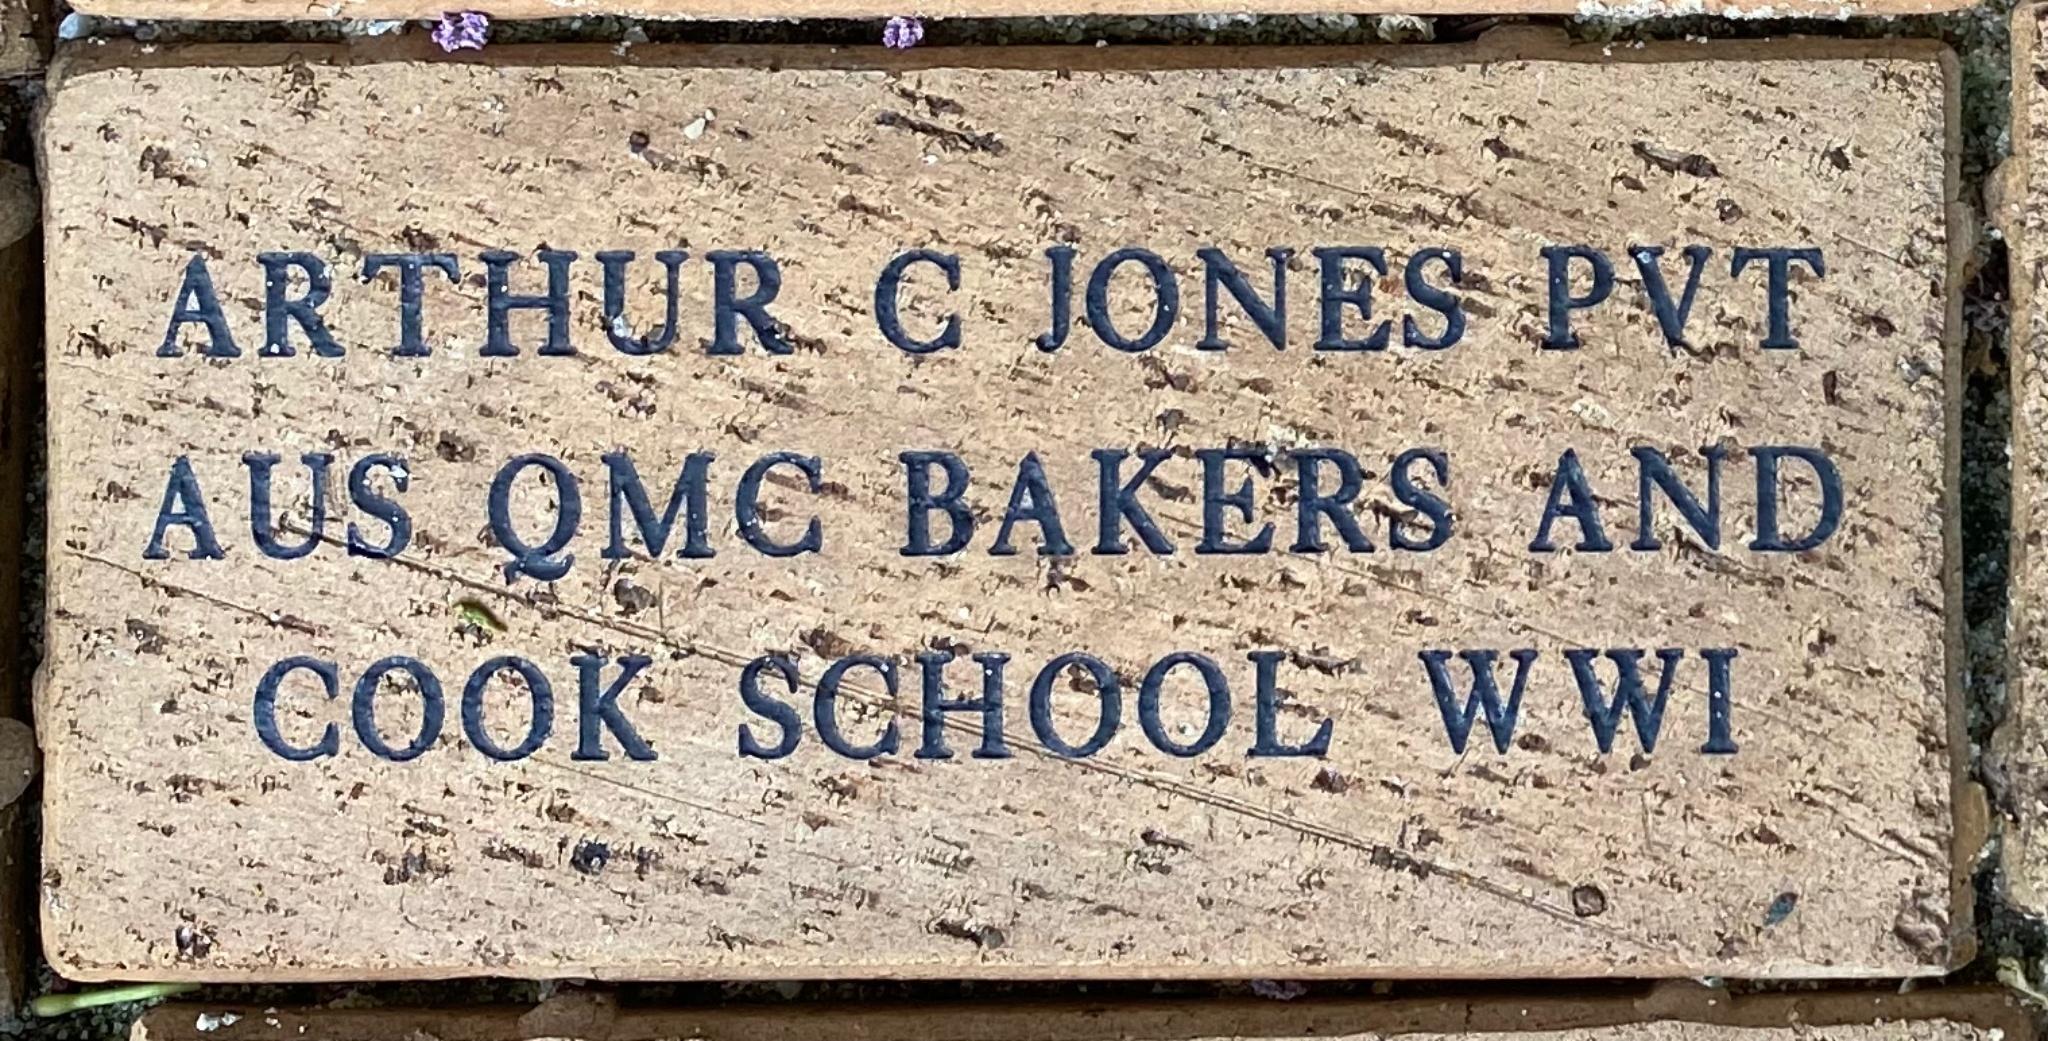 ARTHUR C JONES PVT A US QMC BAKERS AND COOK SCHOOL WWI